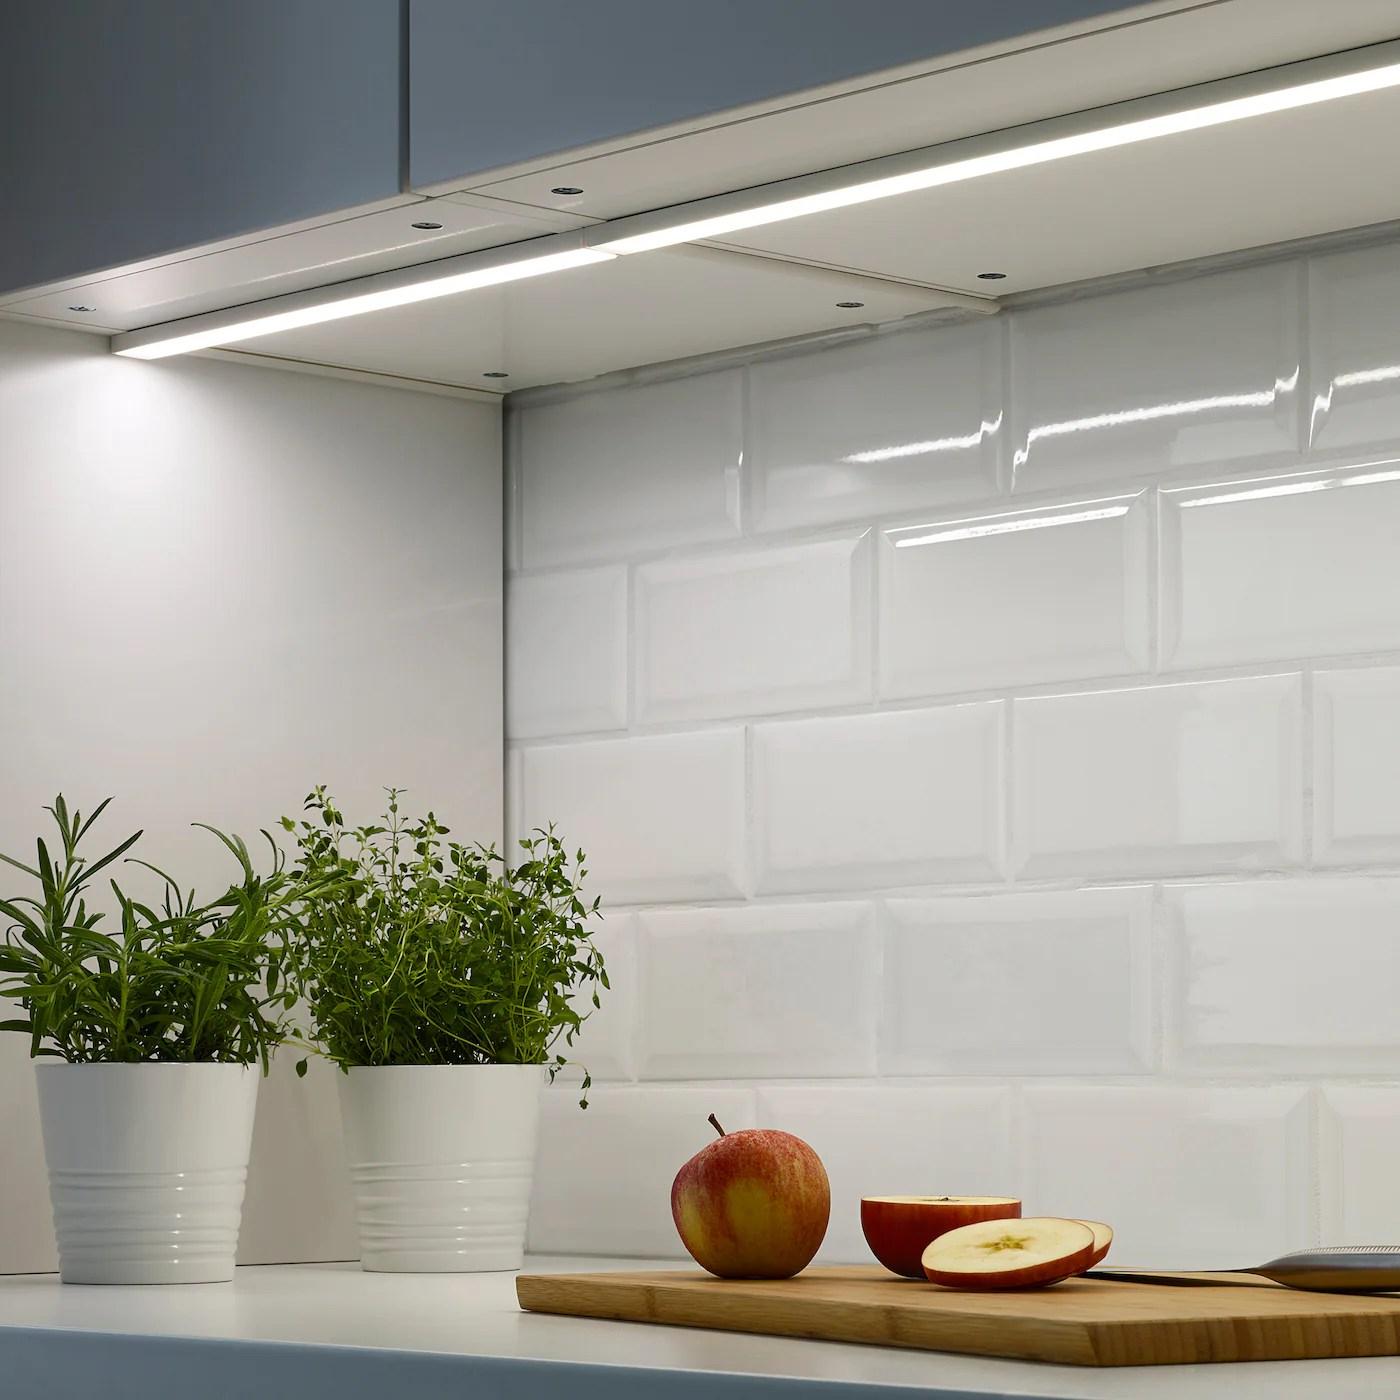 omlopp eclairage plan travail a led blanc 40 cm